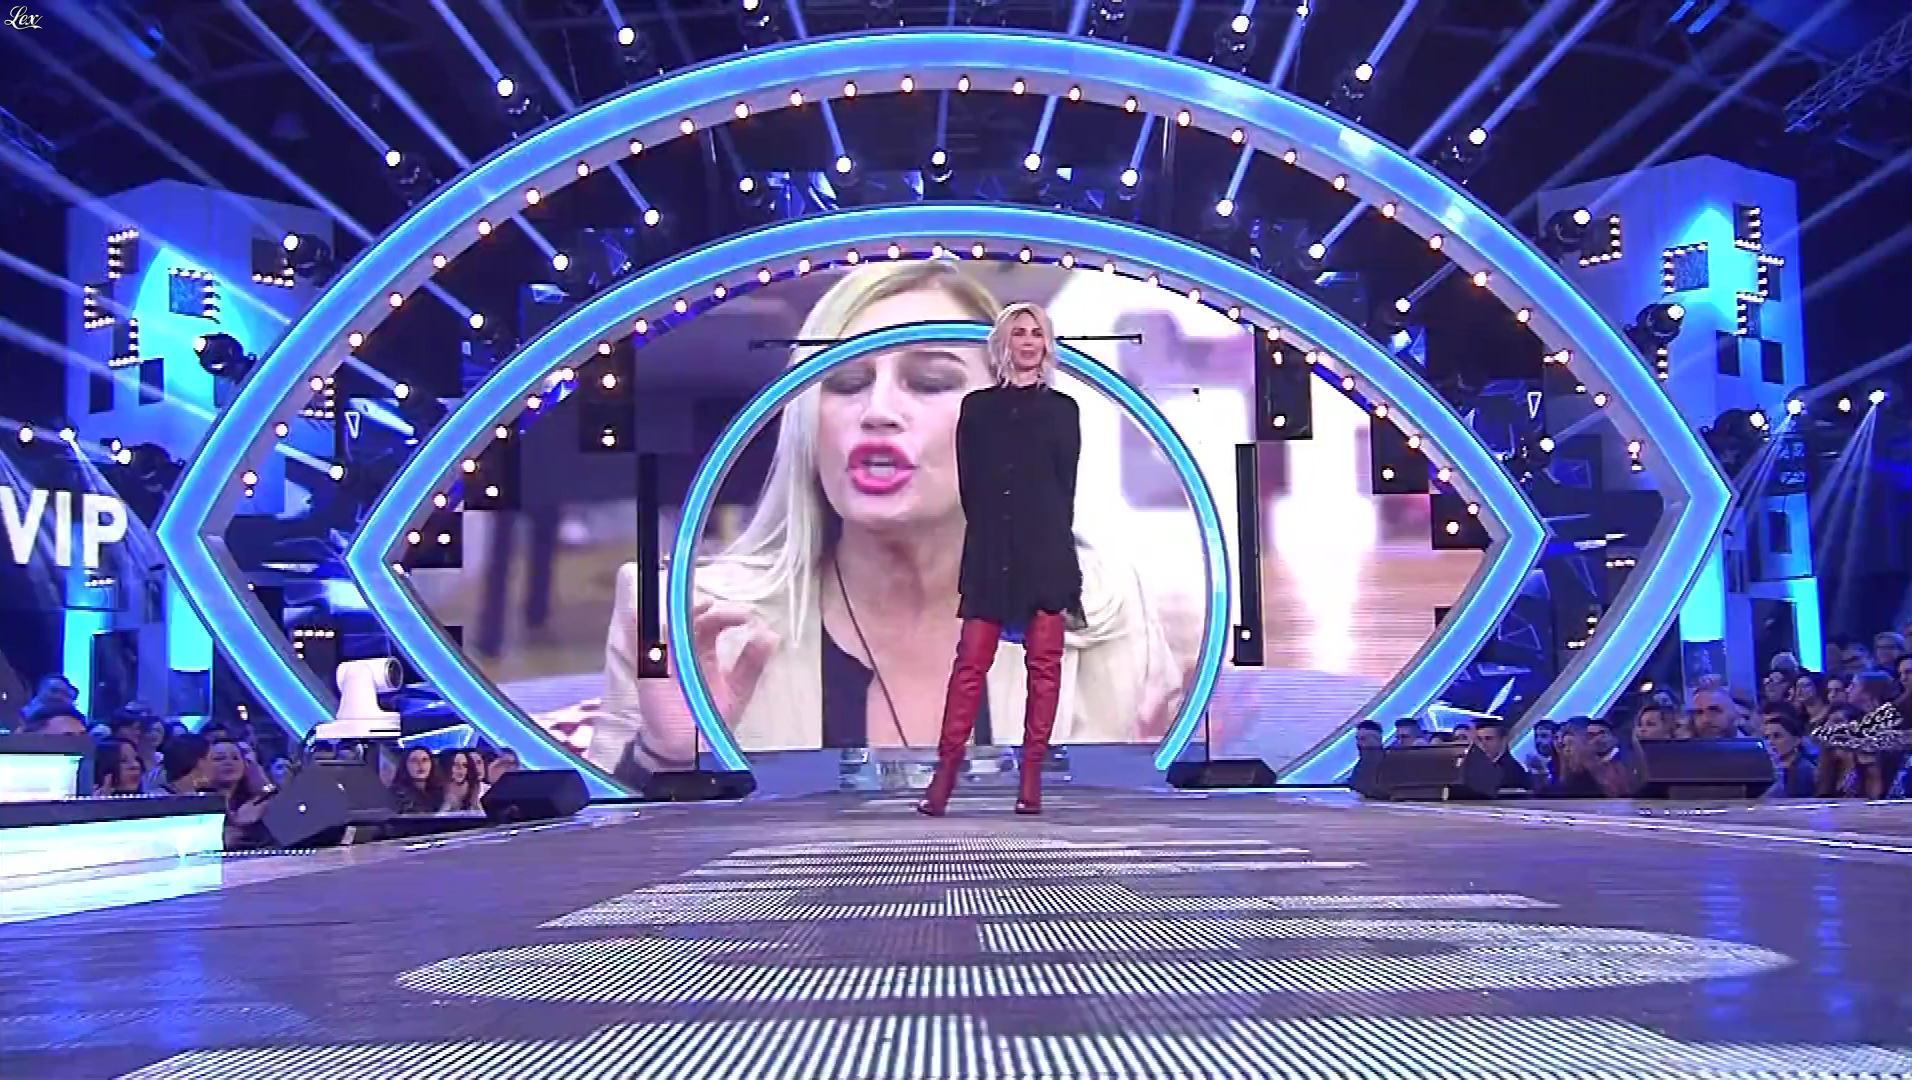 Ilary Blasi dans Grande Fratello VIP. Diffusé à la télévision le 22/11/18.